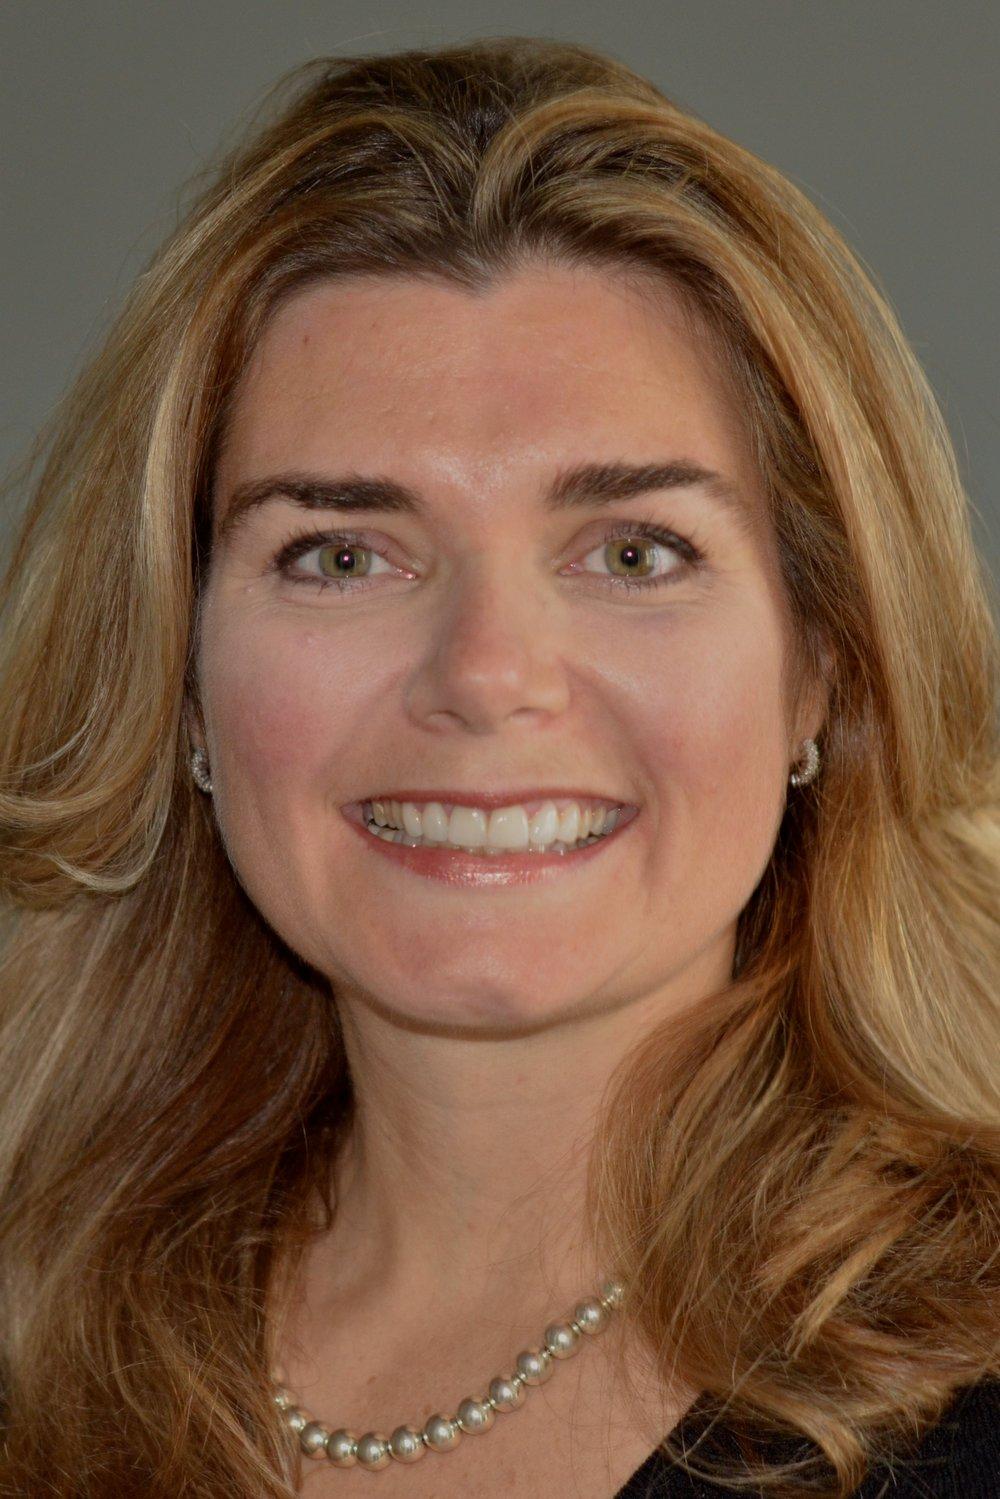 Dr. Brezden_s Picture 2012.jpg